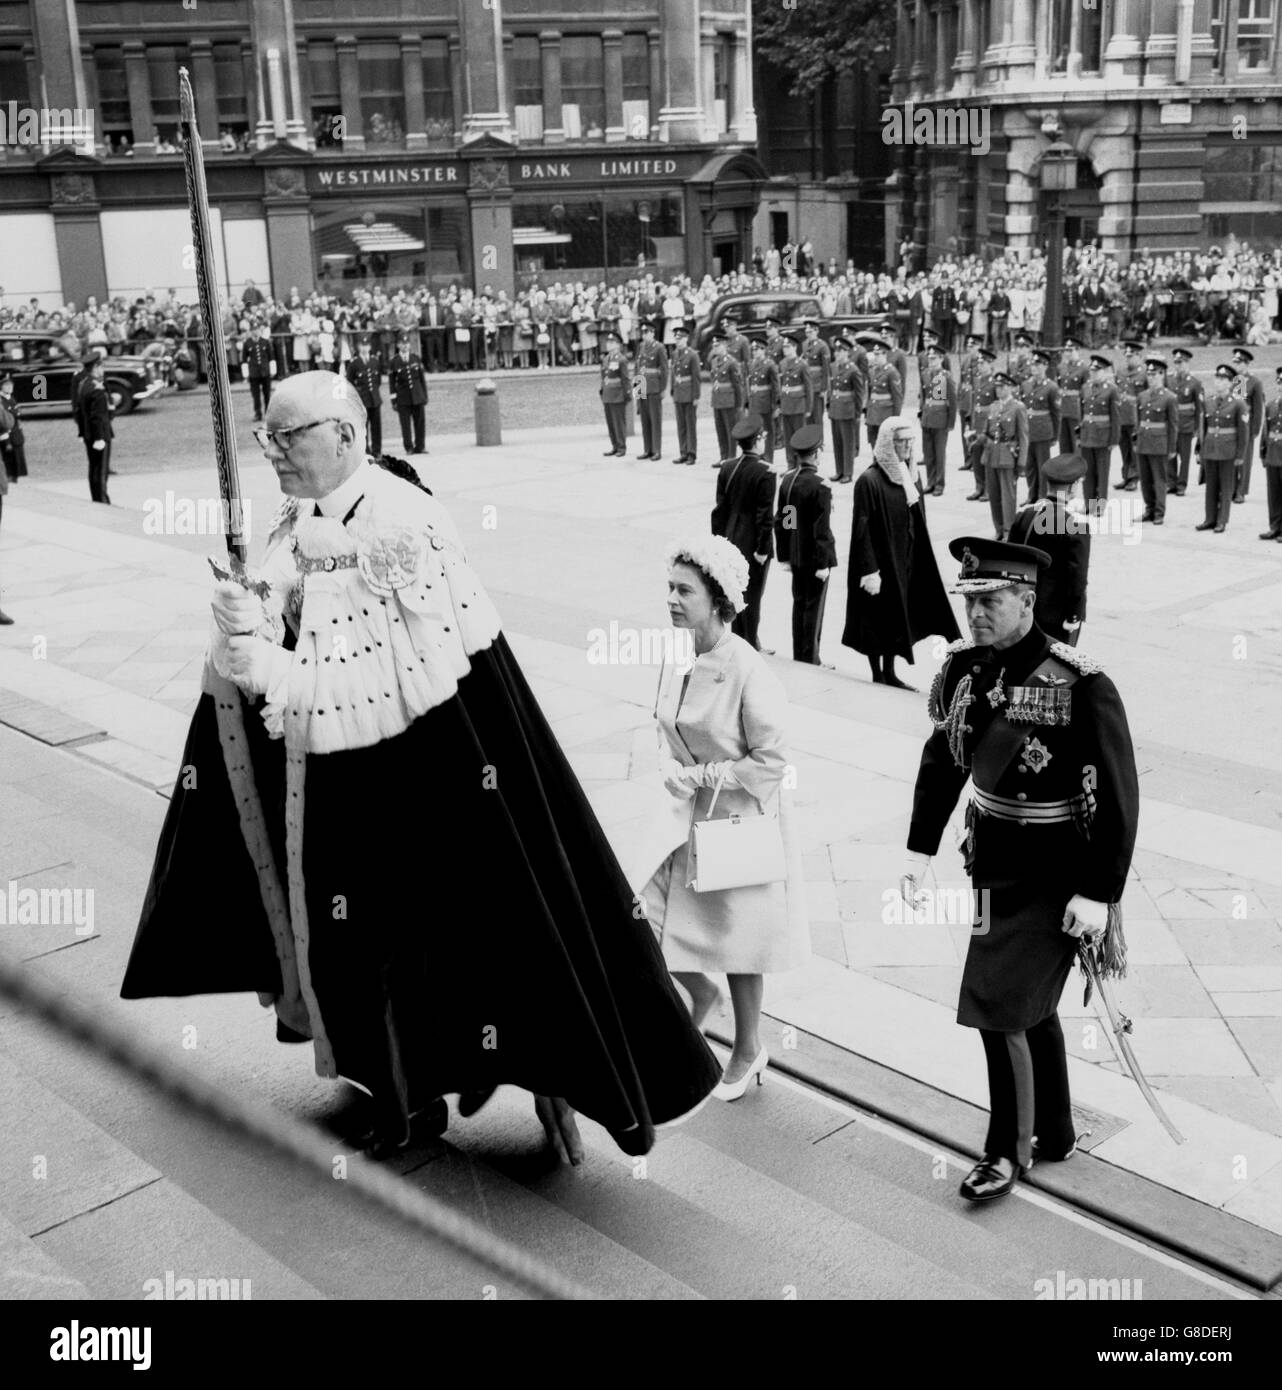 Royalty - Regiment of Artillery Thanksgiving Service - en Elizabeth II and Prince Philip - London - Stock Image